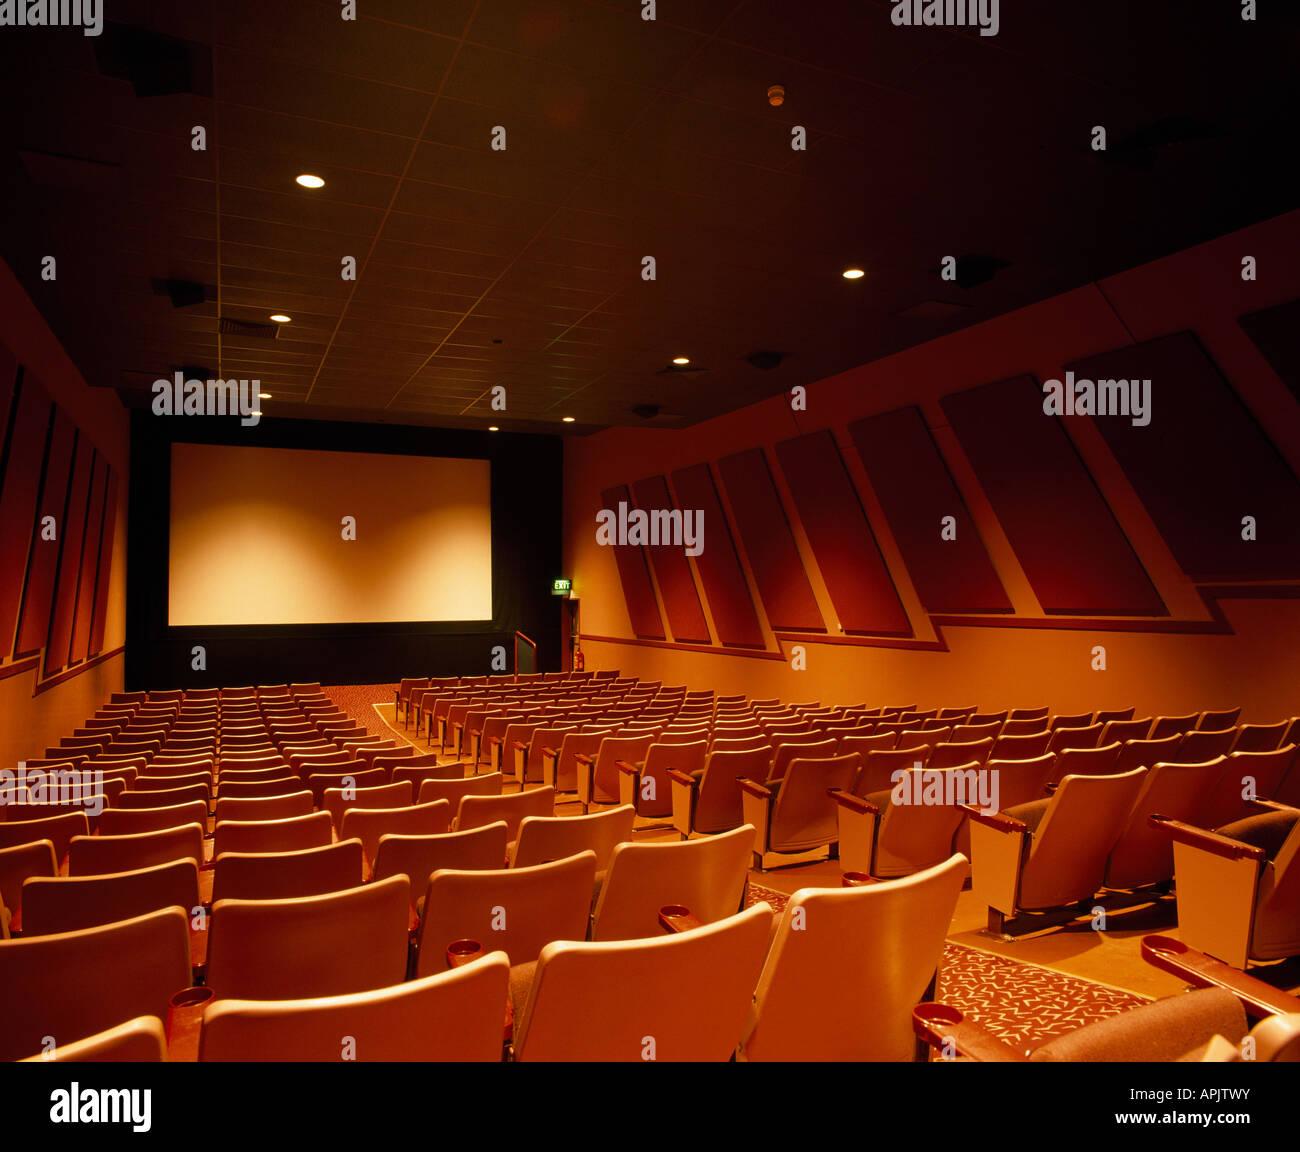 Cinéma Photo Stock